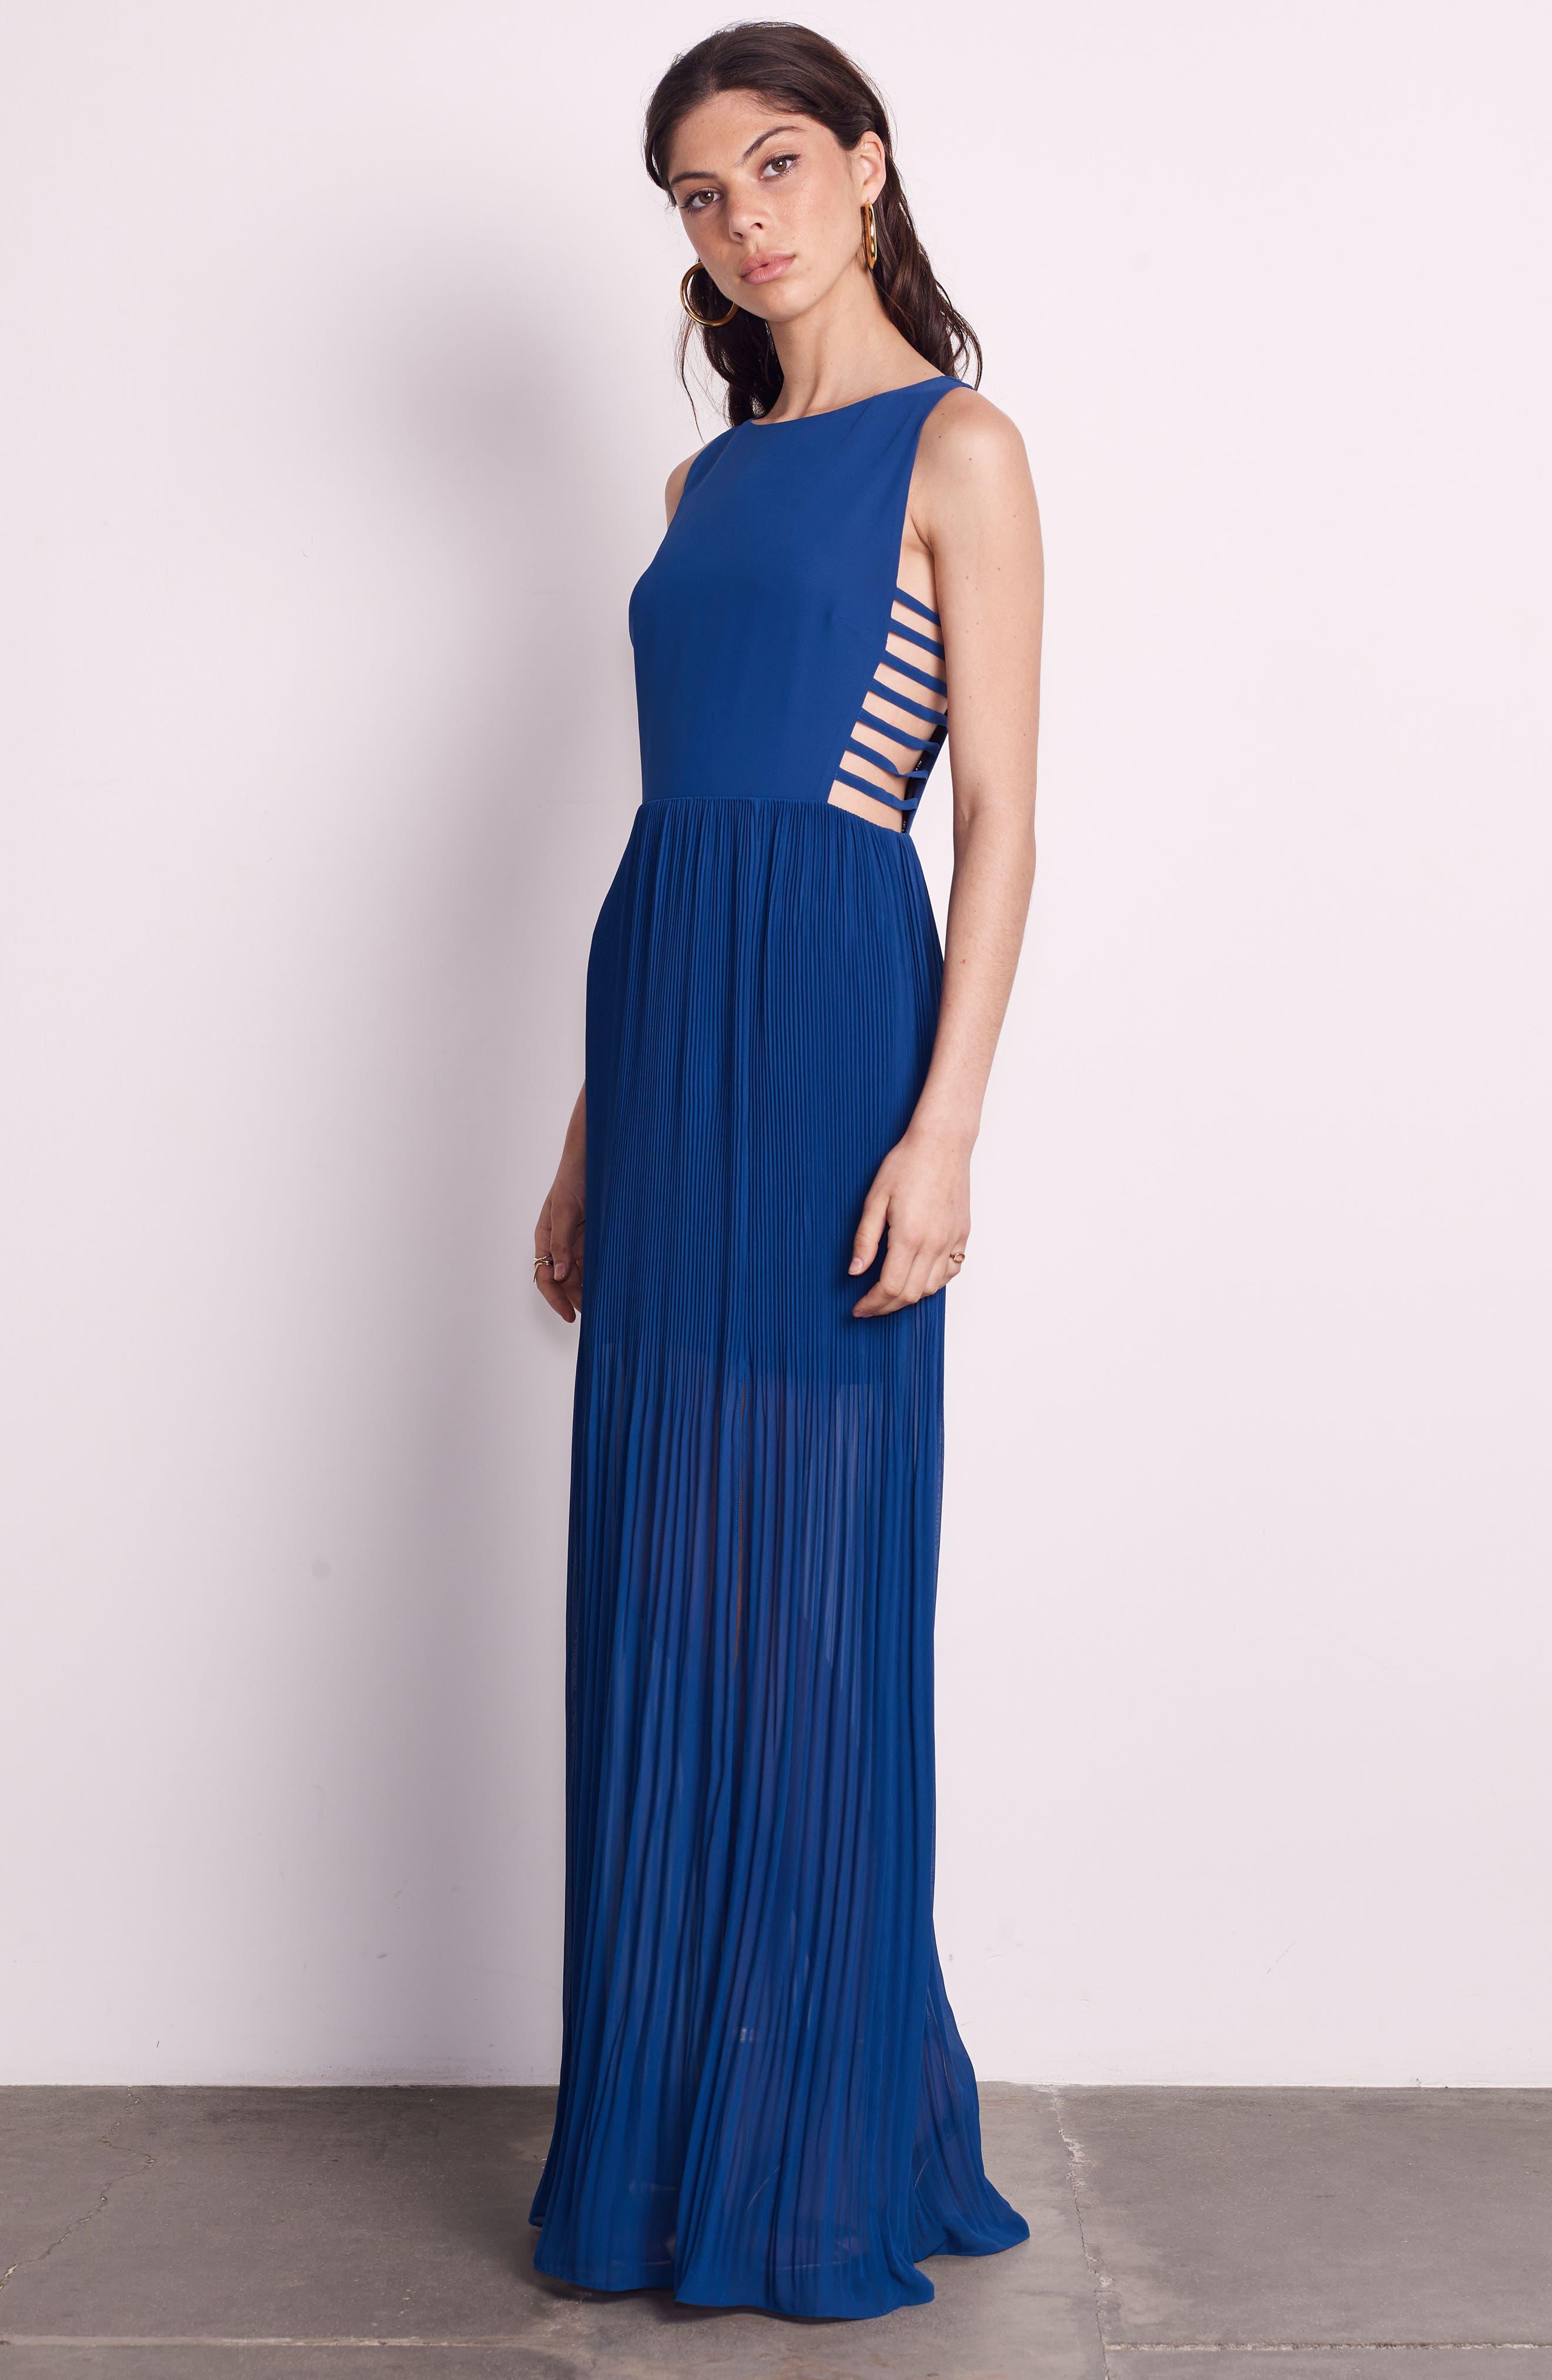 Sunset Blvd Maxi Dress,                             Alternate thumbnail 2, color,                             French Blue